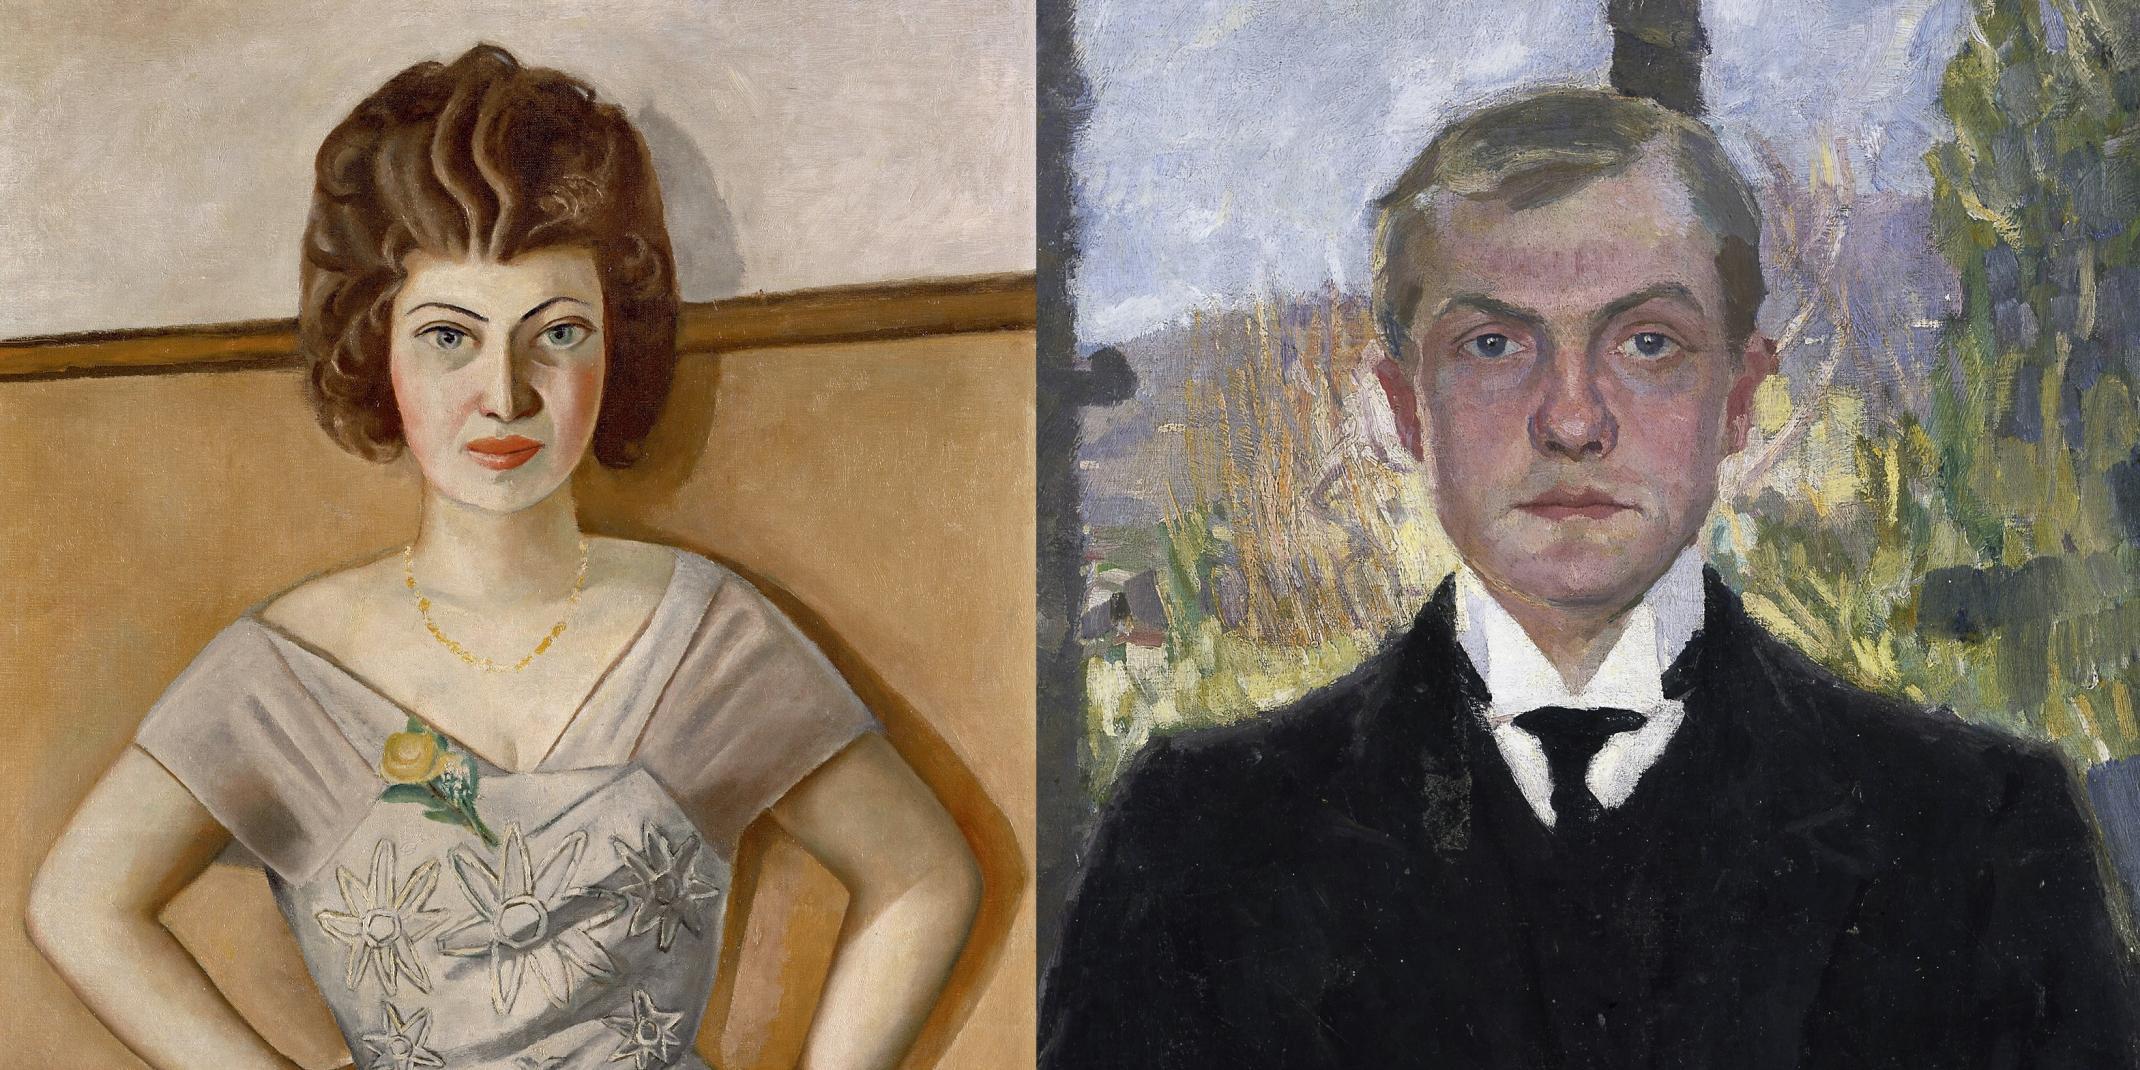 Collage: links Max Beckmann (1884–1950) Bildnis einer Rumänin (Bildnis Frau Dr. Heidel), 1922, © SHK / Hamburg, rechts: Selbstbildnis Florenz, 1907, Hamburger Kunsthalle, © VG Bild-Kunst, Bonn 2020